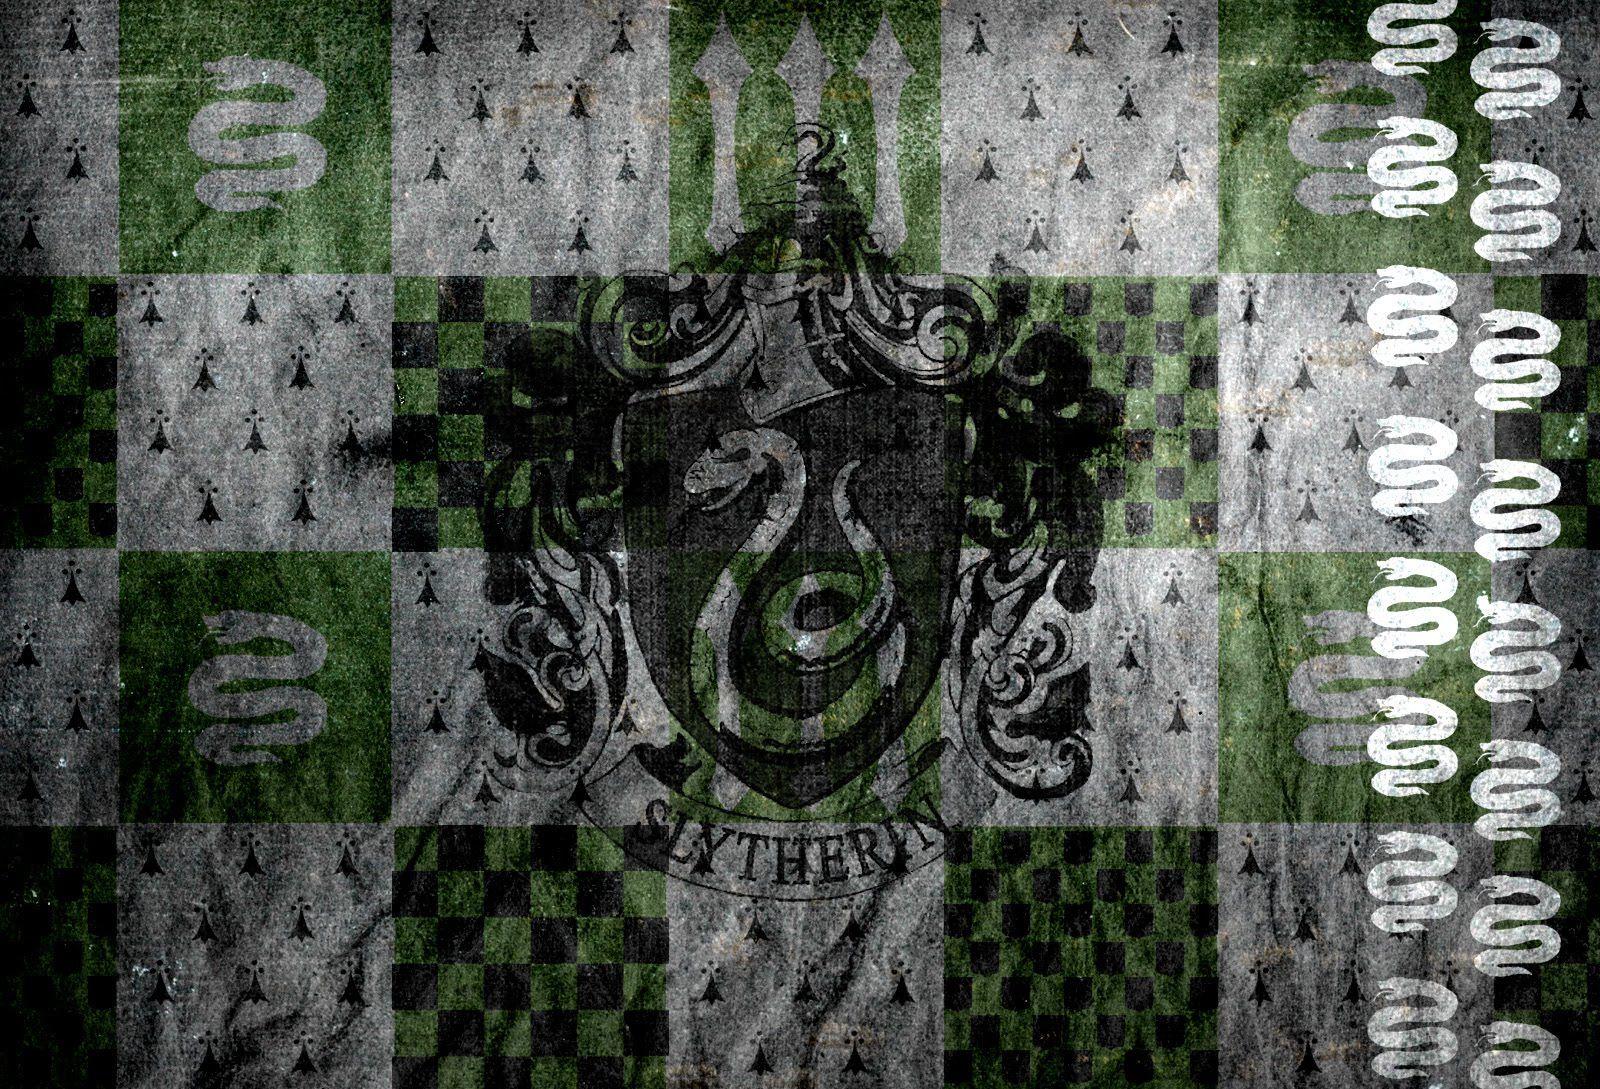 Must see Wallpaper Harry Potter Pottermore - 8df649b99fa3c46ddf324ce0c494428a  HD_854580.jpg